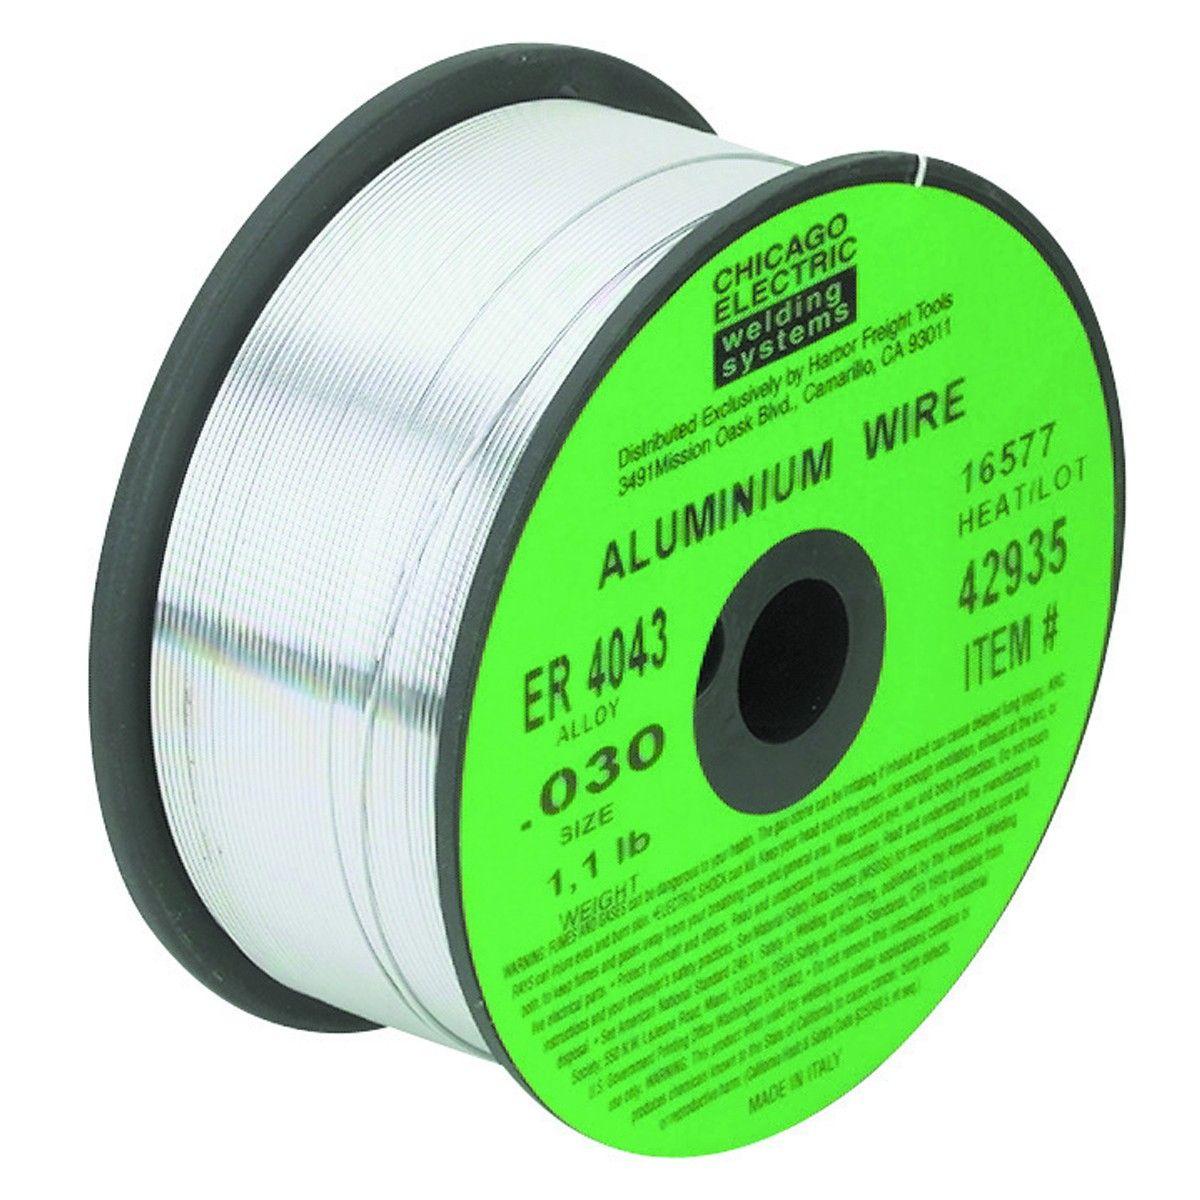 "1.1 Lb. 0.030"" Aluminum WeldingWire (มีรูปภาพ)"